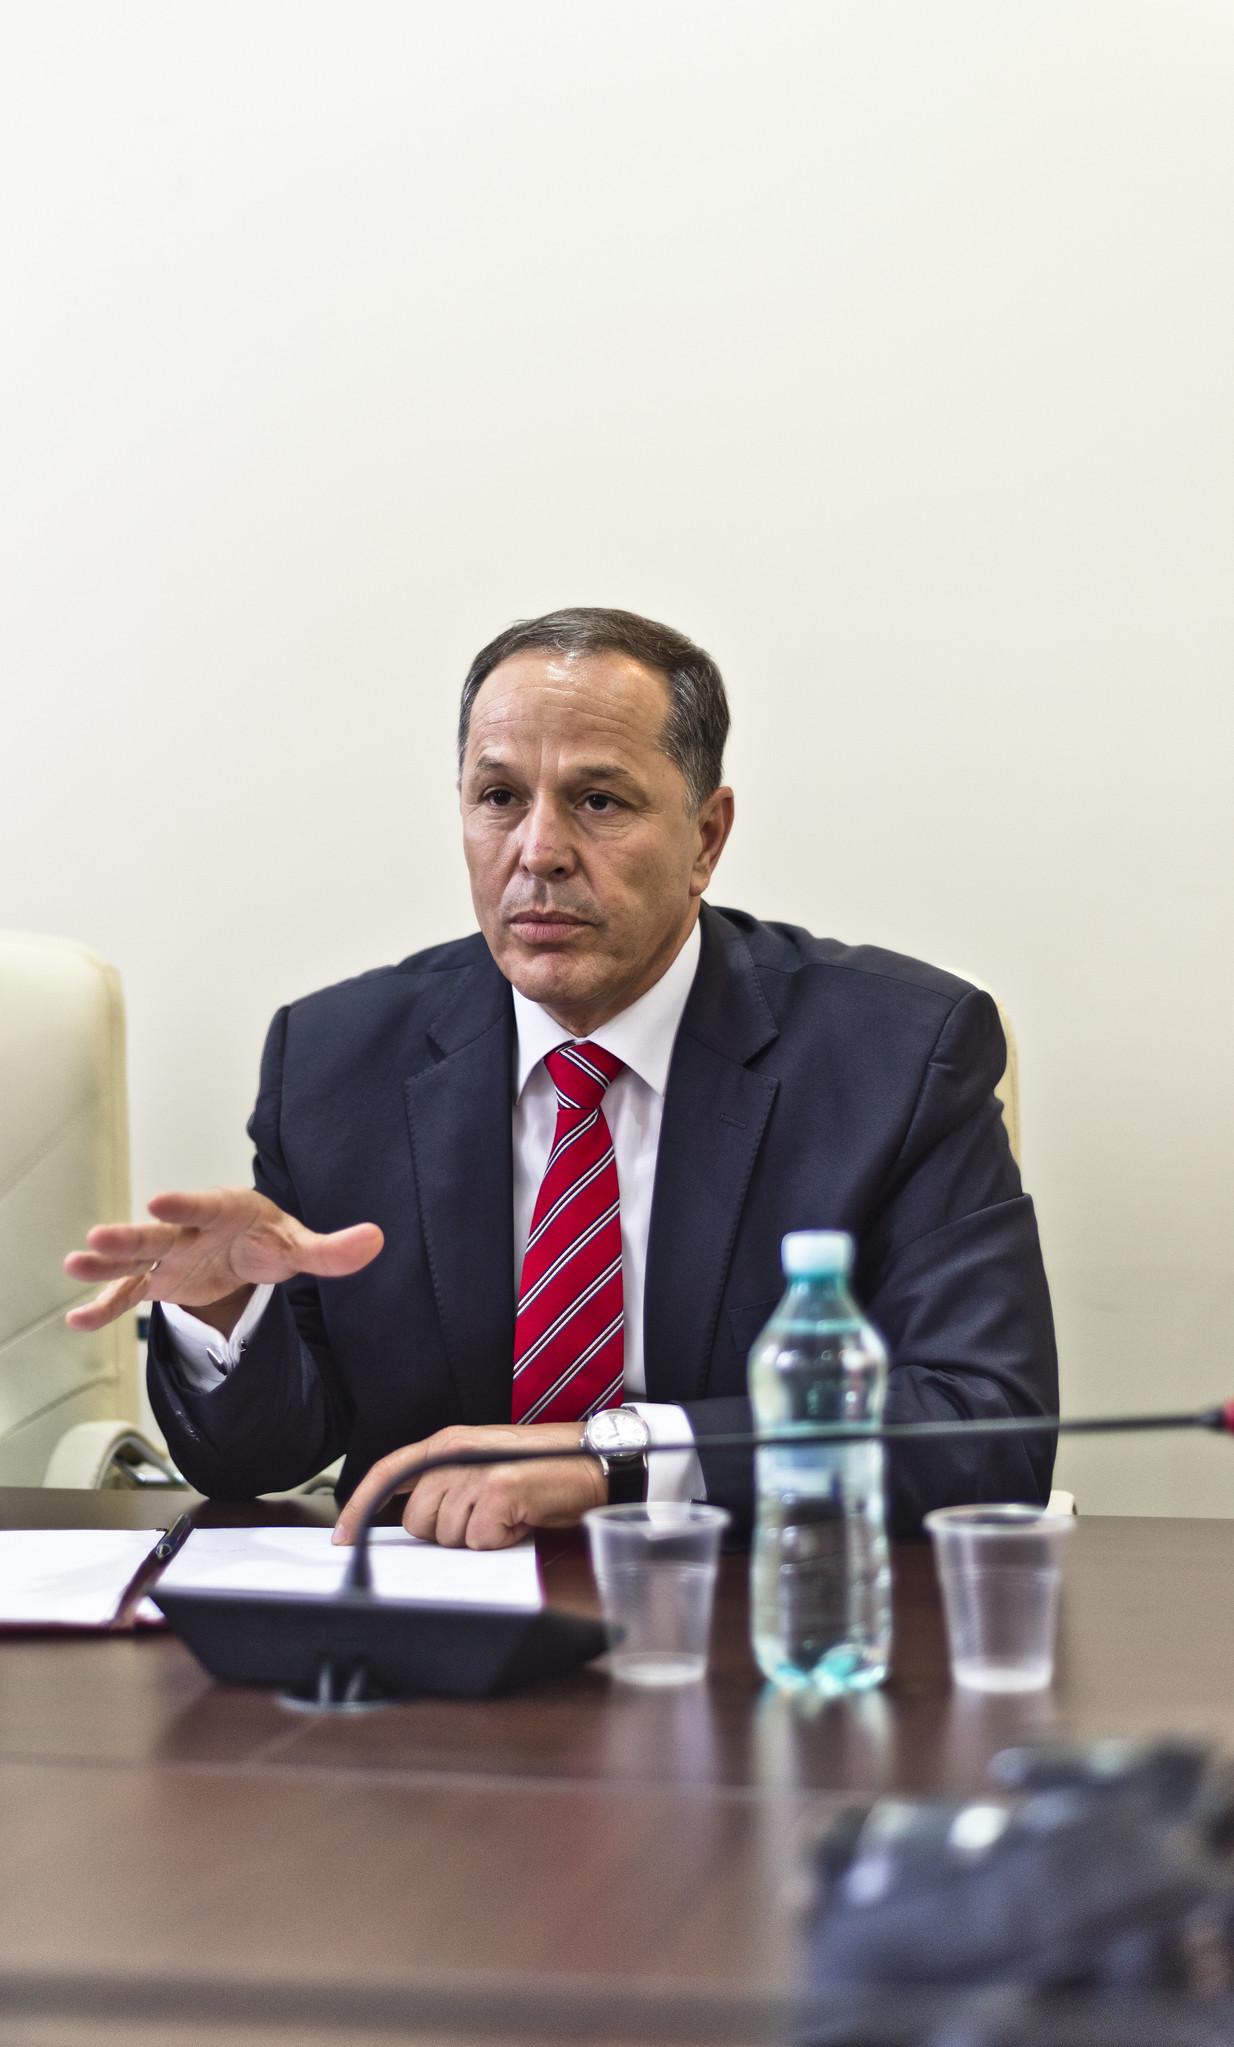 Michail Formuzal